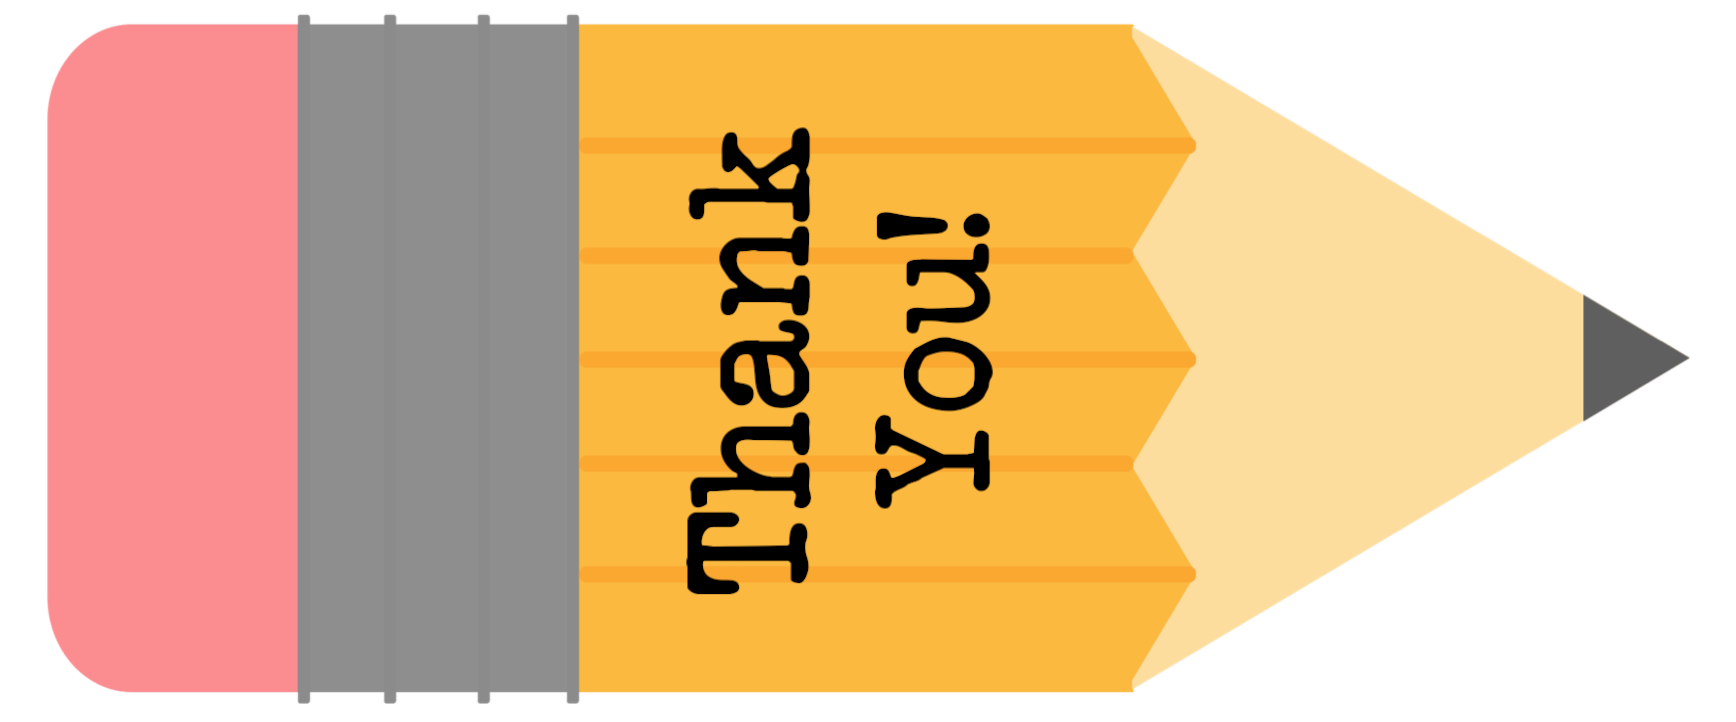 best teacher ever free printable pencil gift tag thank you free printable teacher pencil gift tag